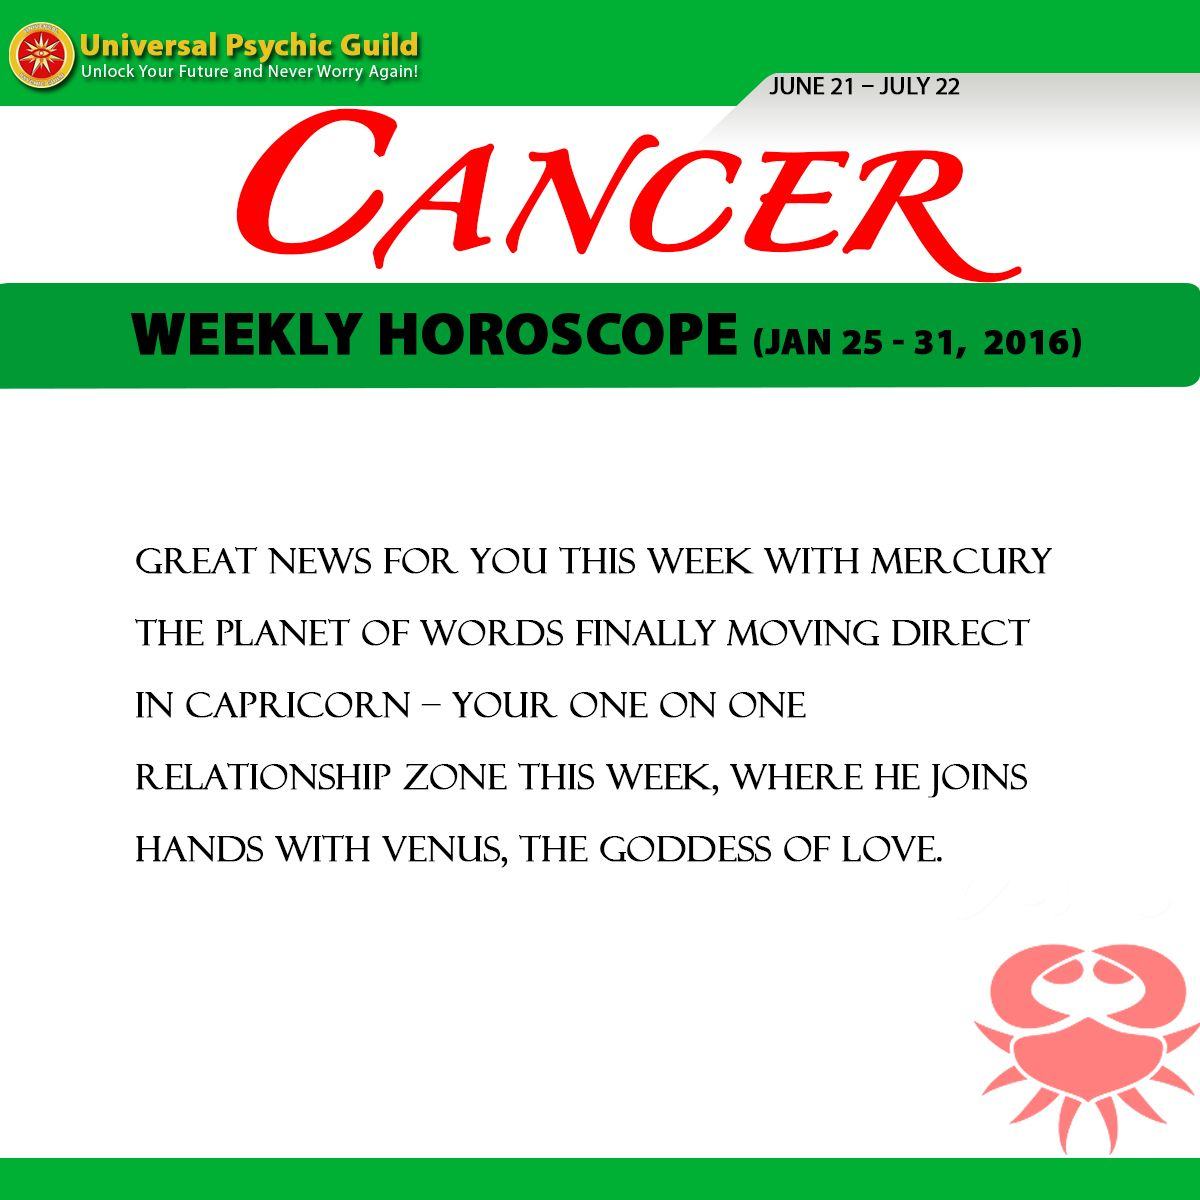 Cancer Single Love Horoscope Weekly - CancerWalls